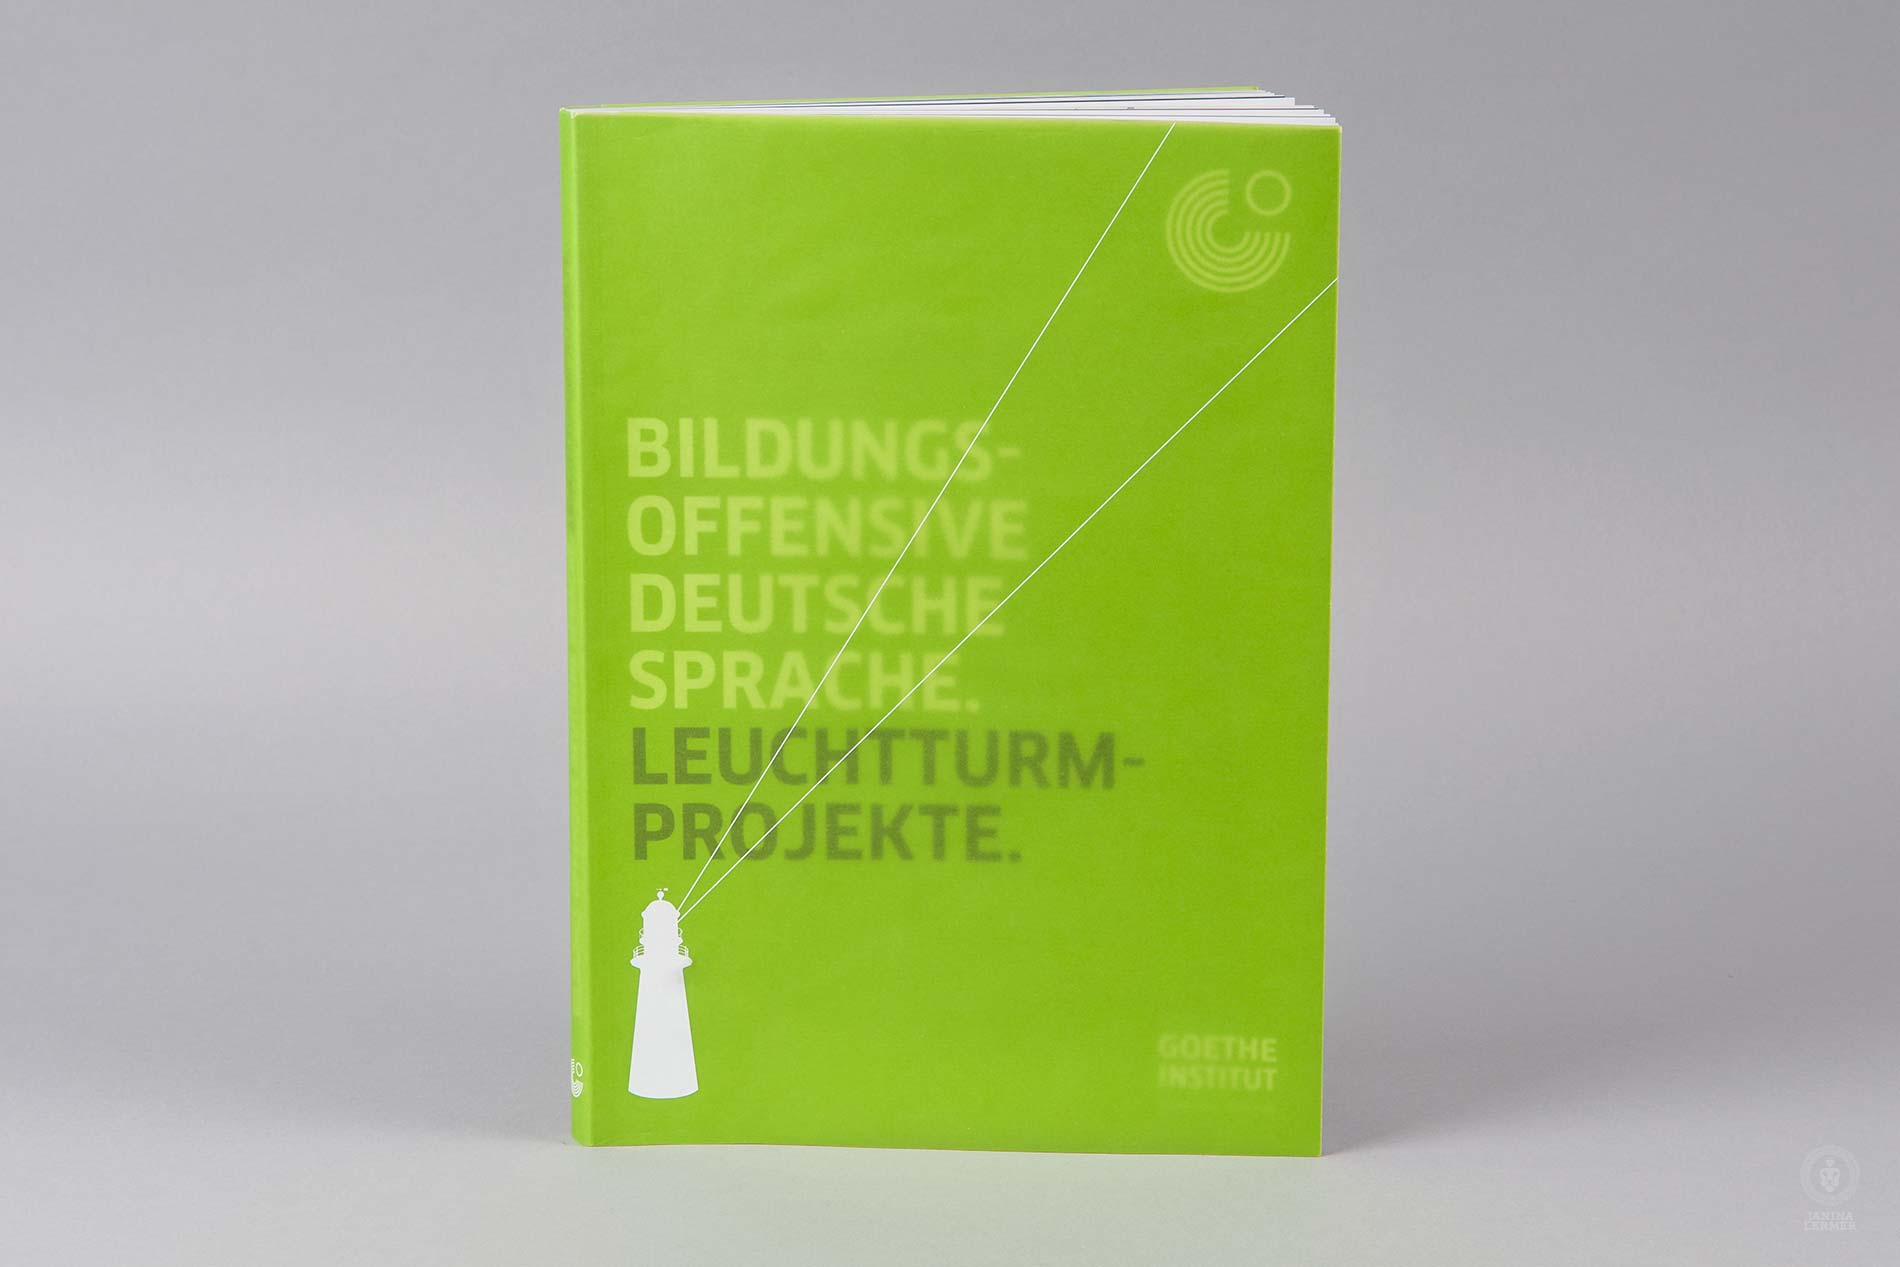 Janina-Lermer-Buchgestaltung-Magazingestaltung-Editorialdesign-Titel-Title-Goethe_Institut